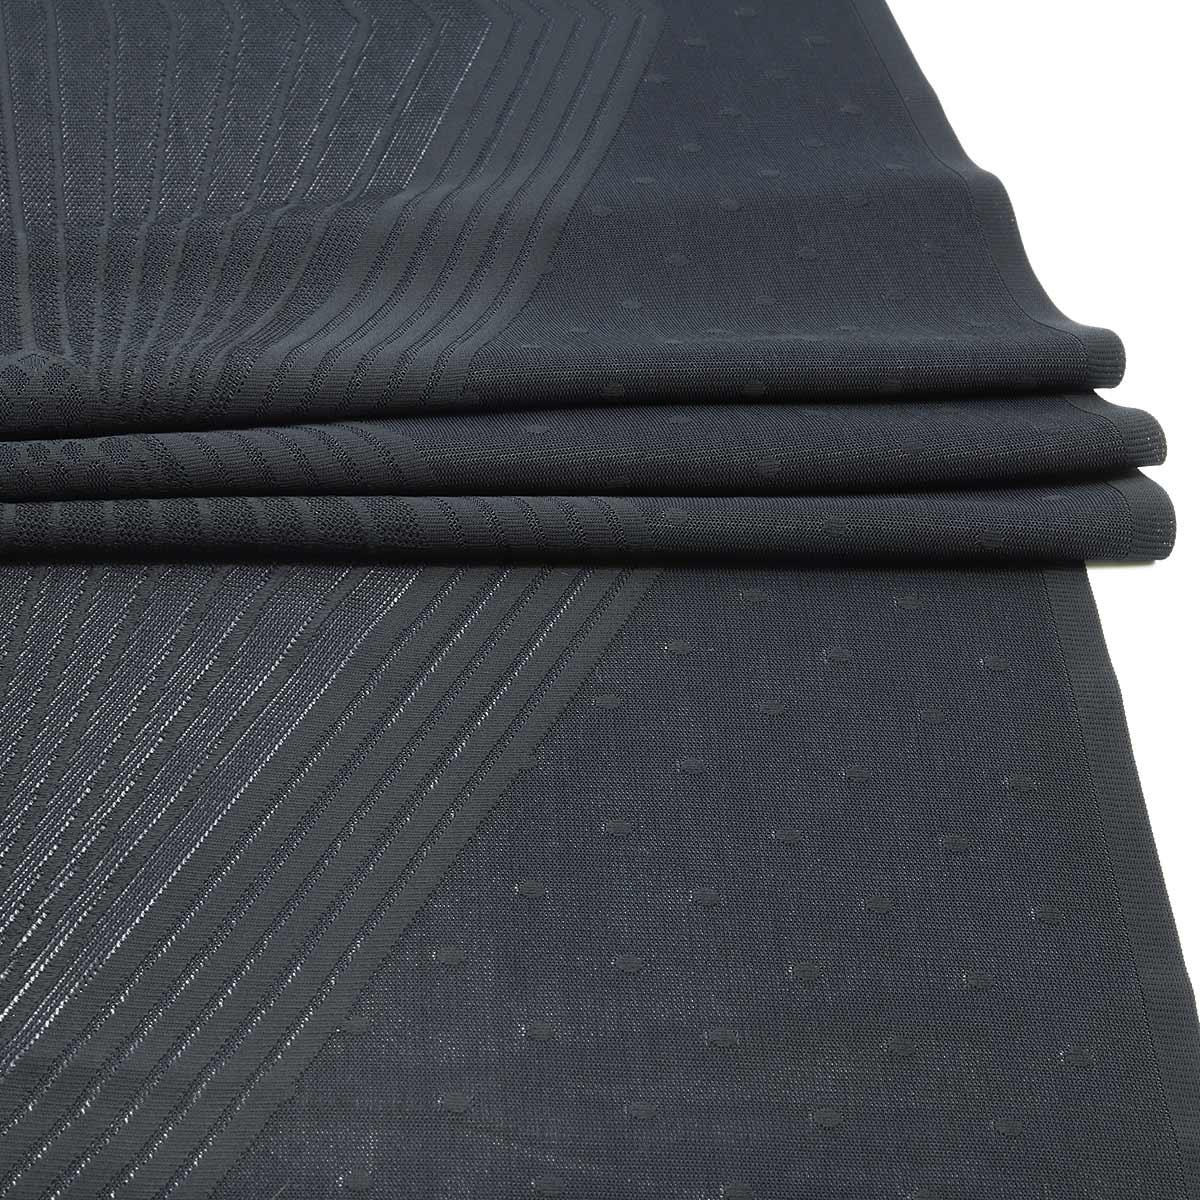 SU-114 Ткань эластичная бельевая 40 см*10 м